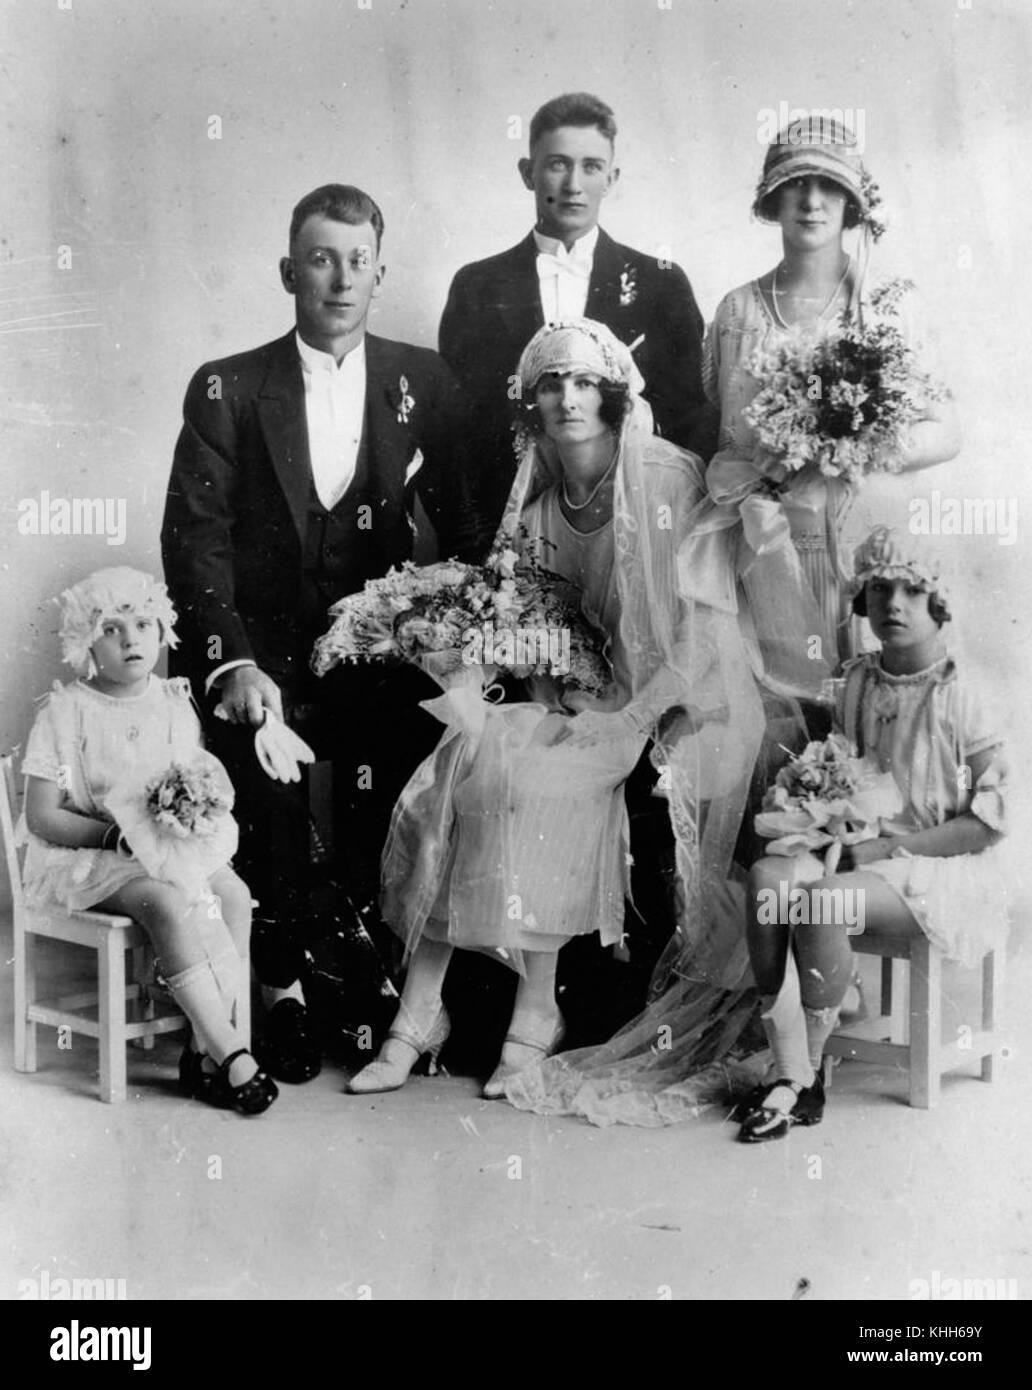 b9e78004763244 1 78355 Wedding of John McDonald and Ruby Wright